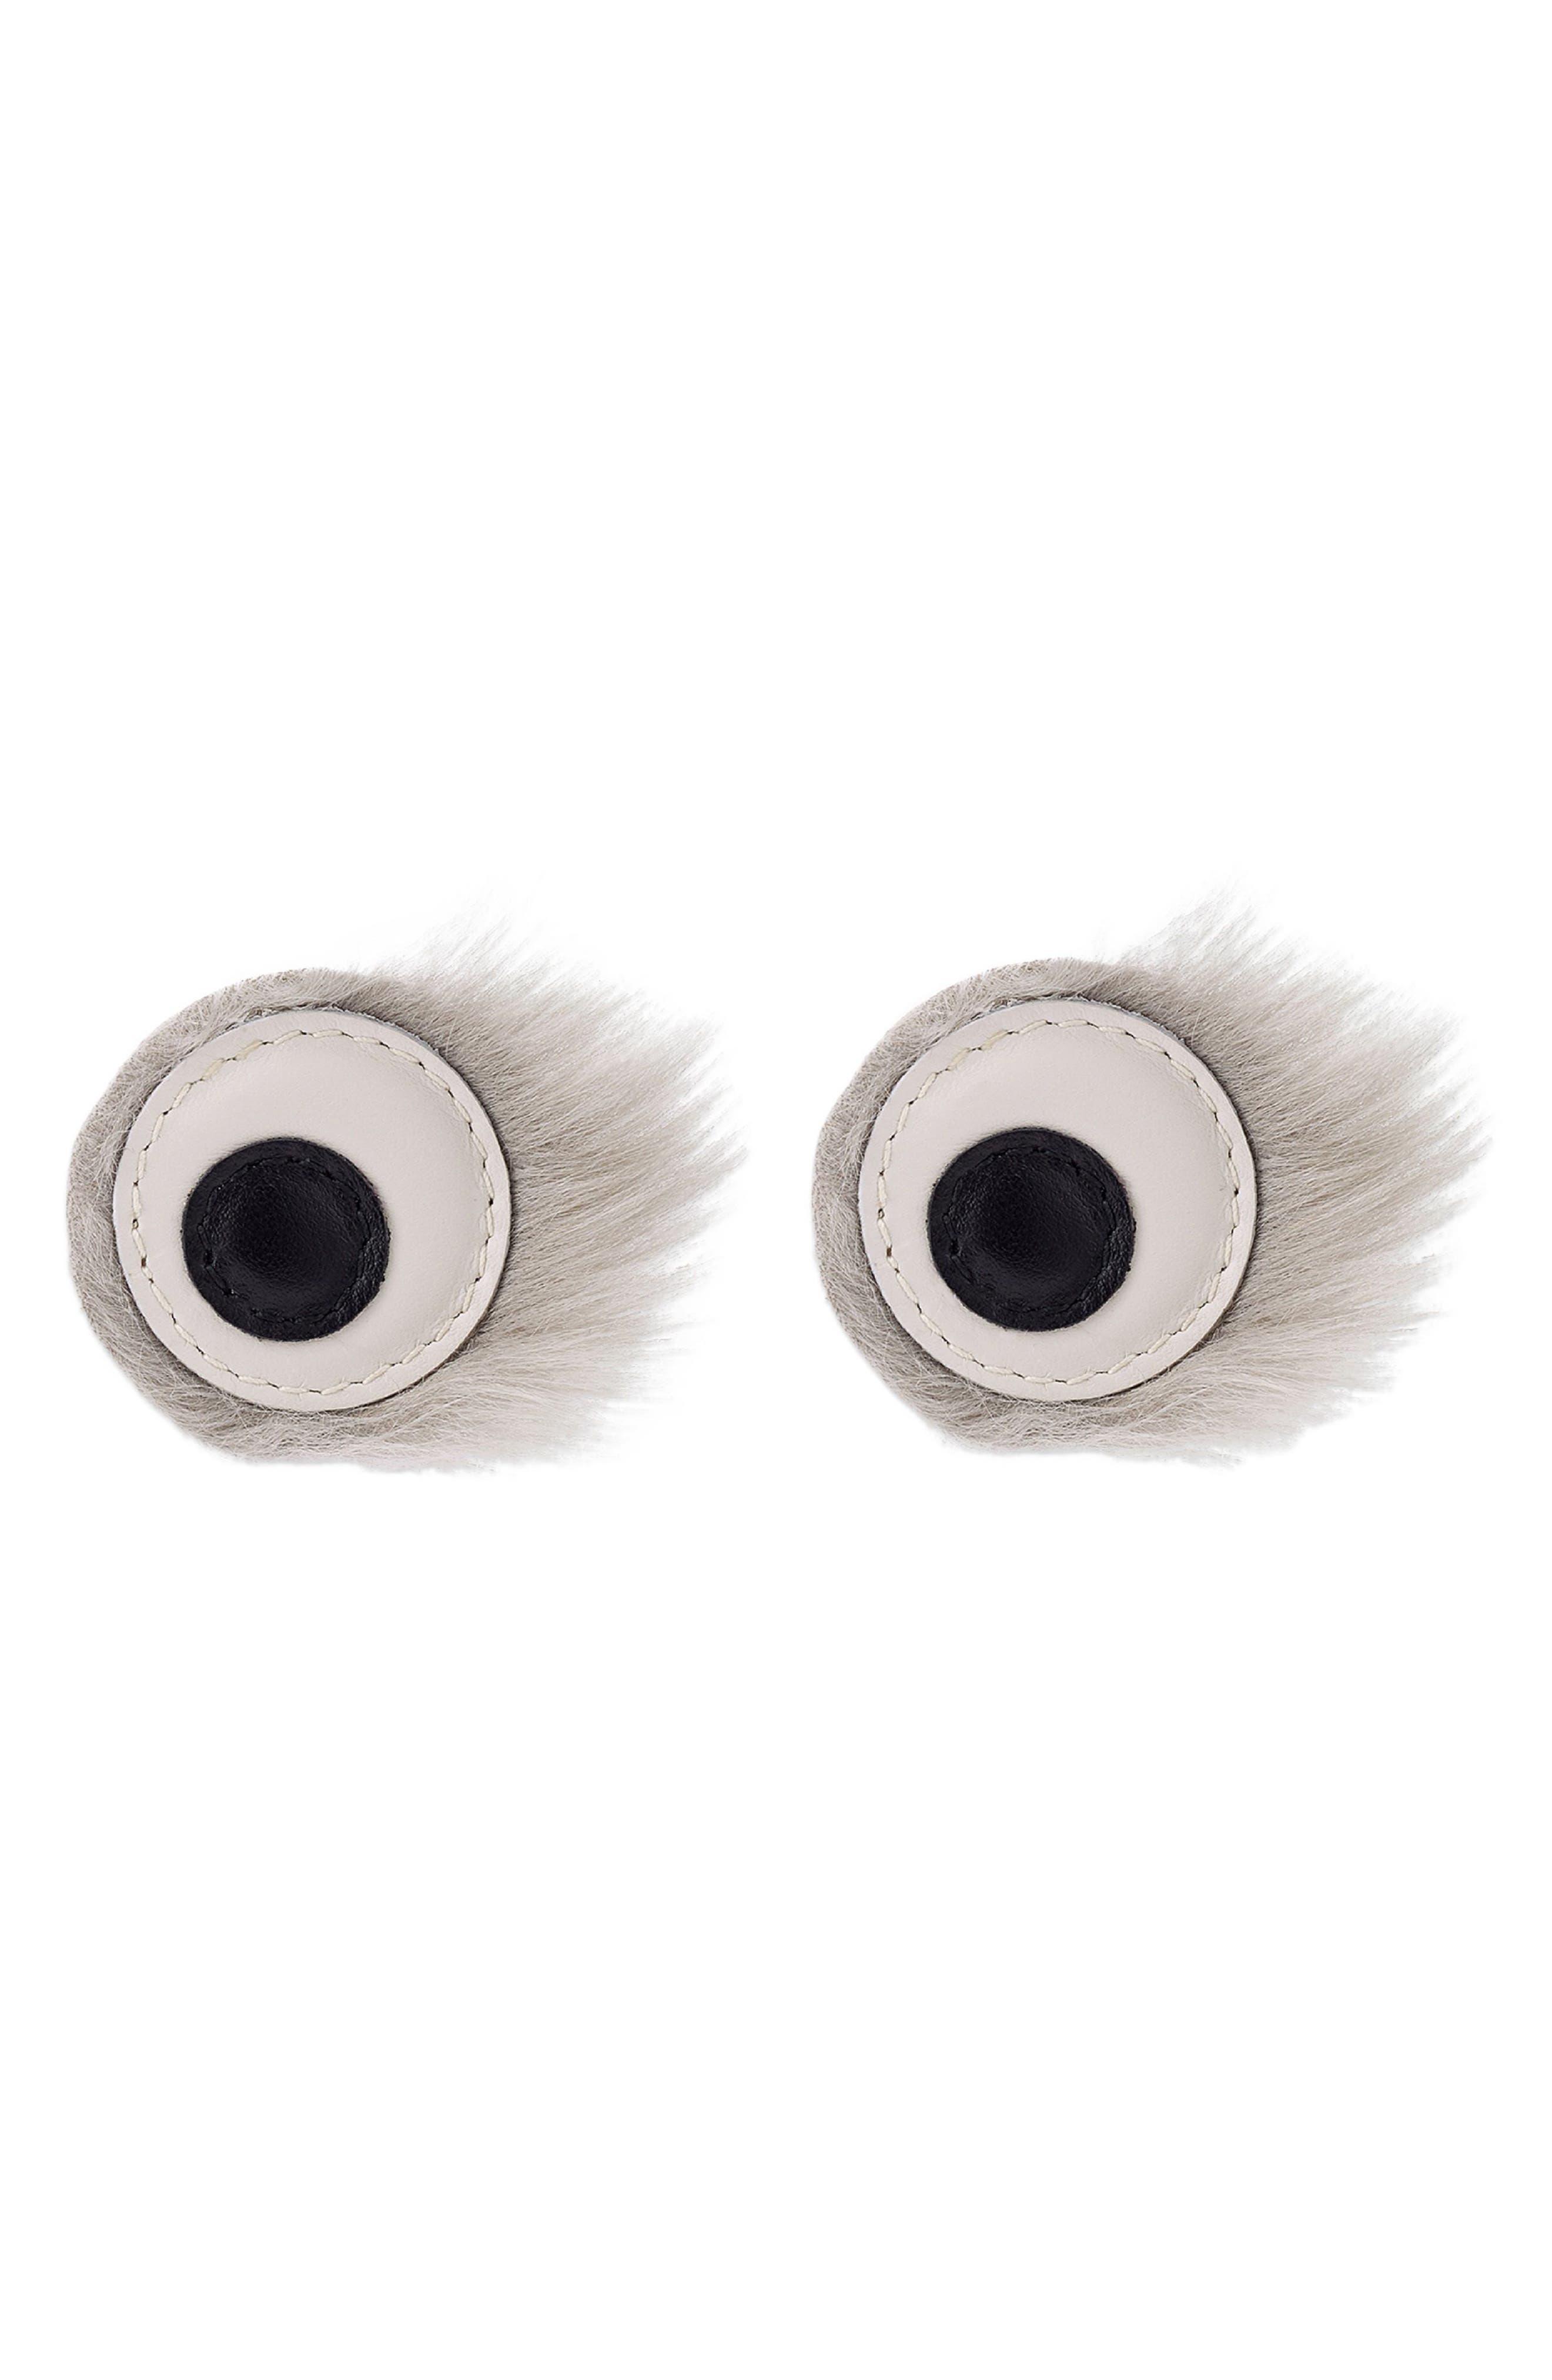 Anya Hindmarch Build a Bag Genuine Shearling Furry Eye Stickers